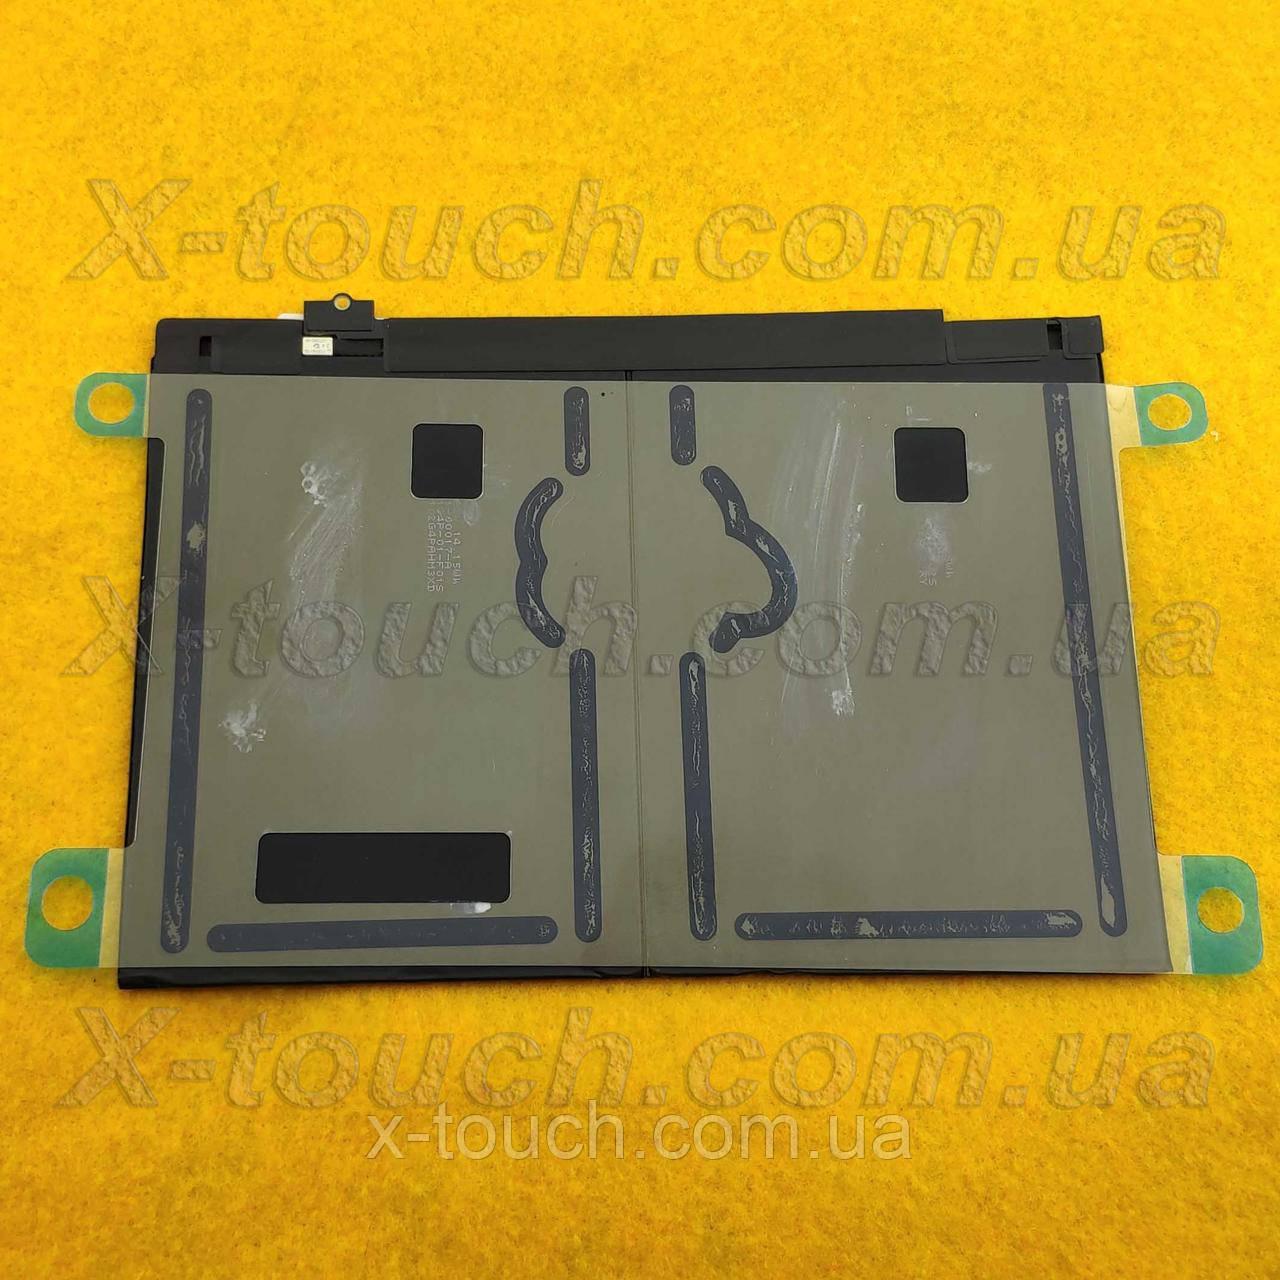 Акумулятор, батарея Apple Ipad6 / Ipad Air2 для планшета 7340mAh.